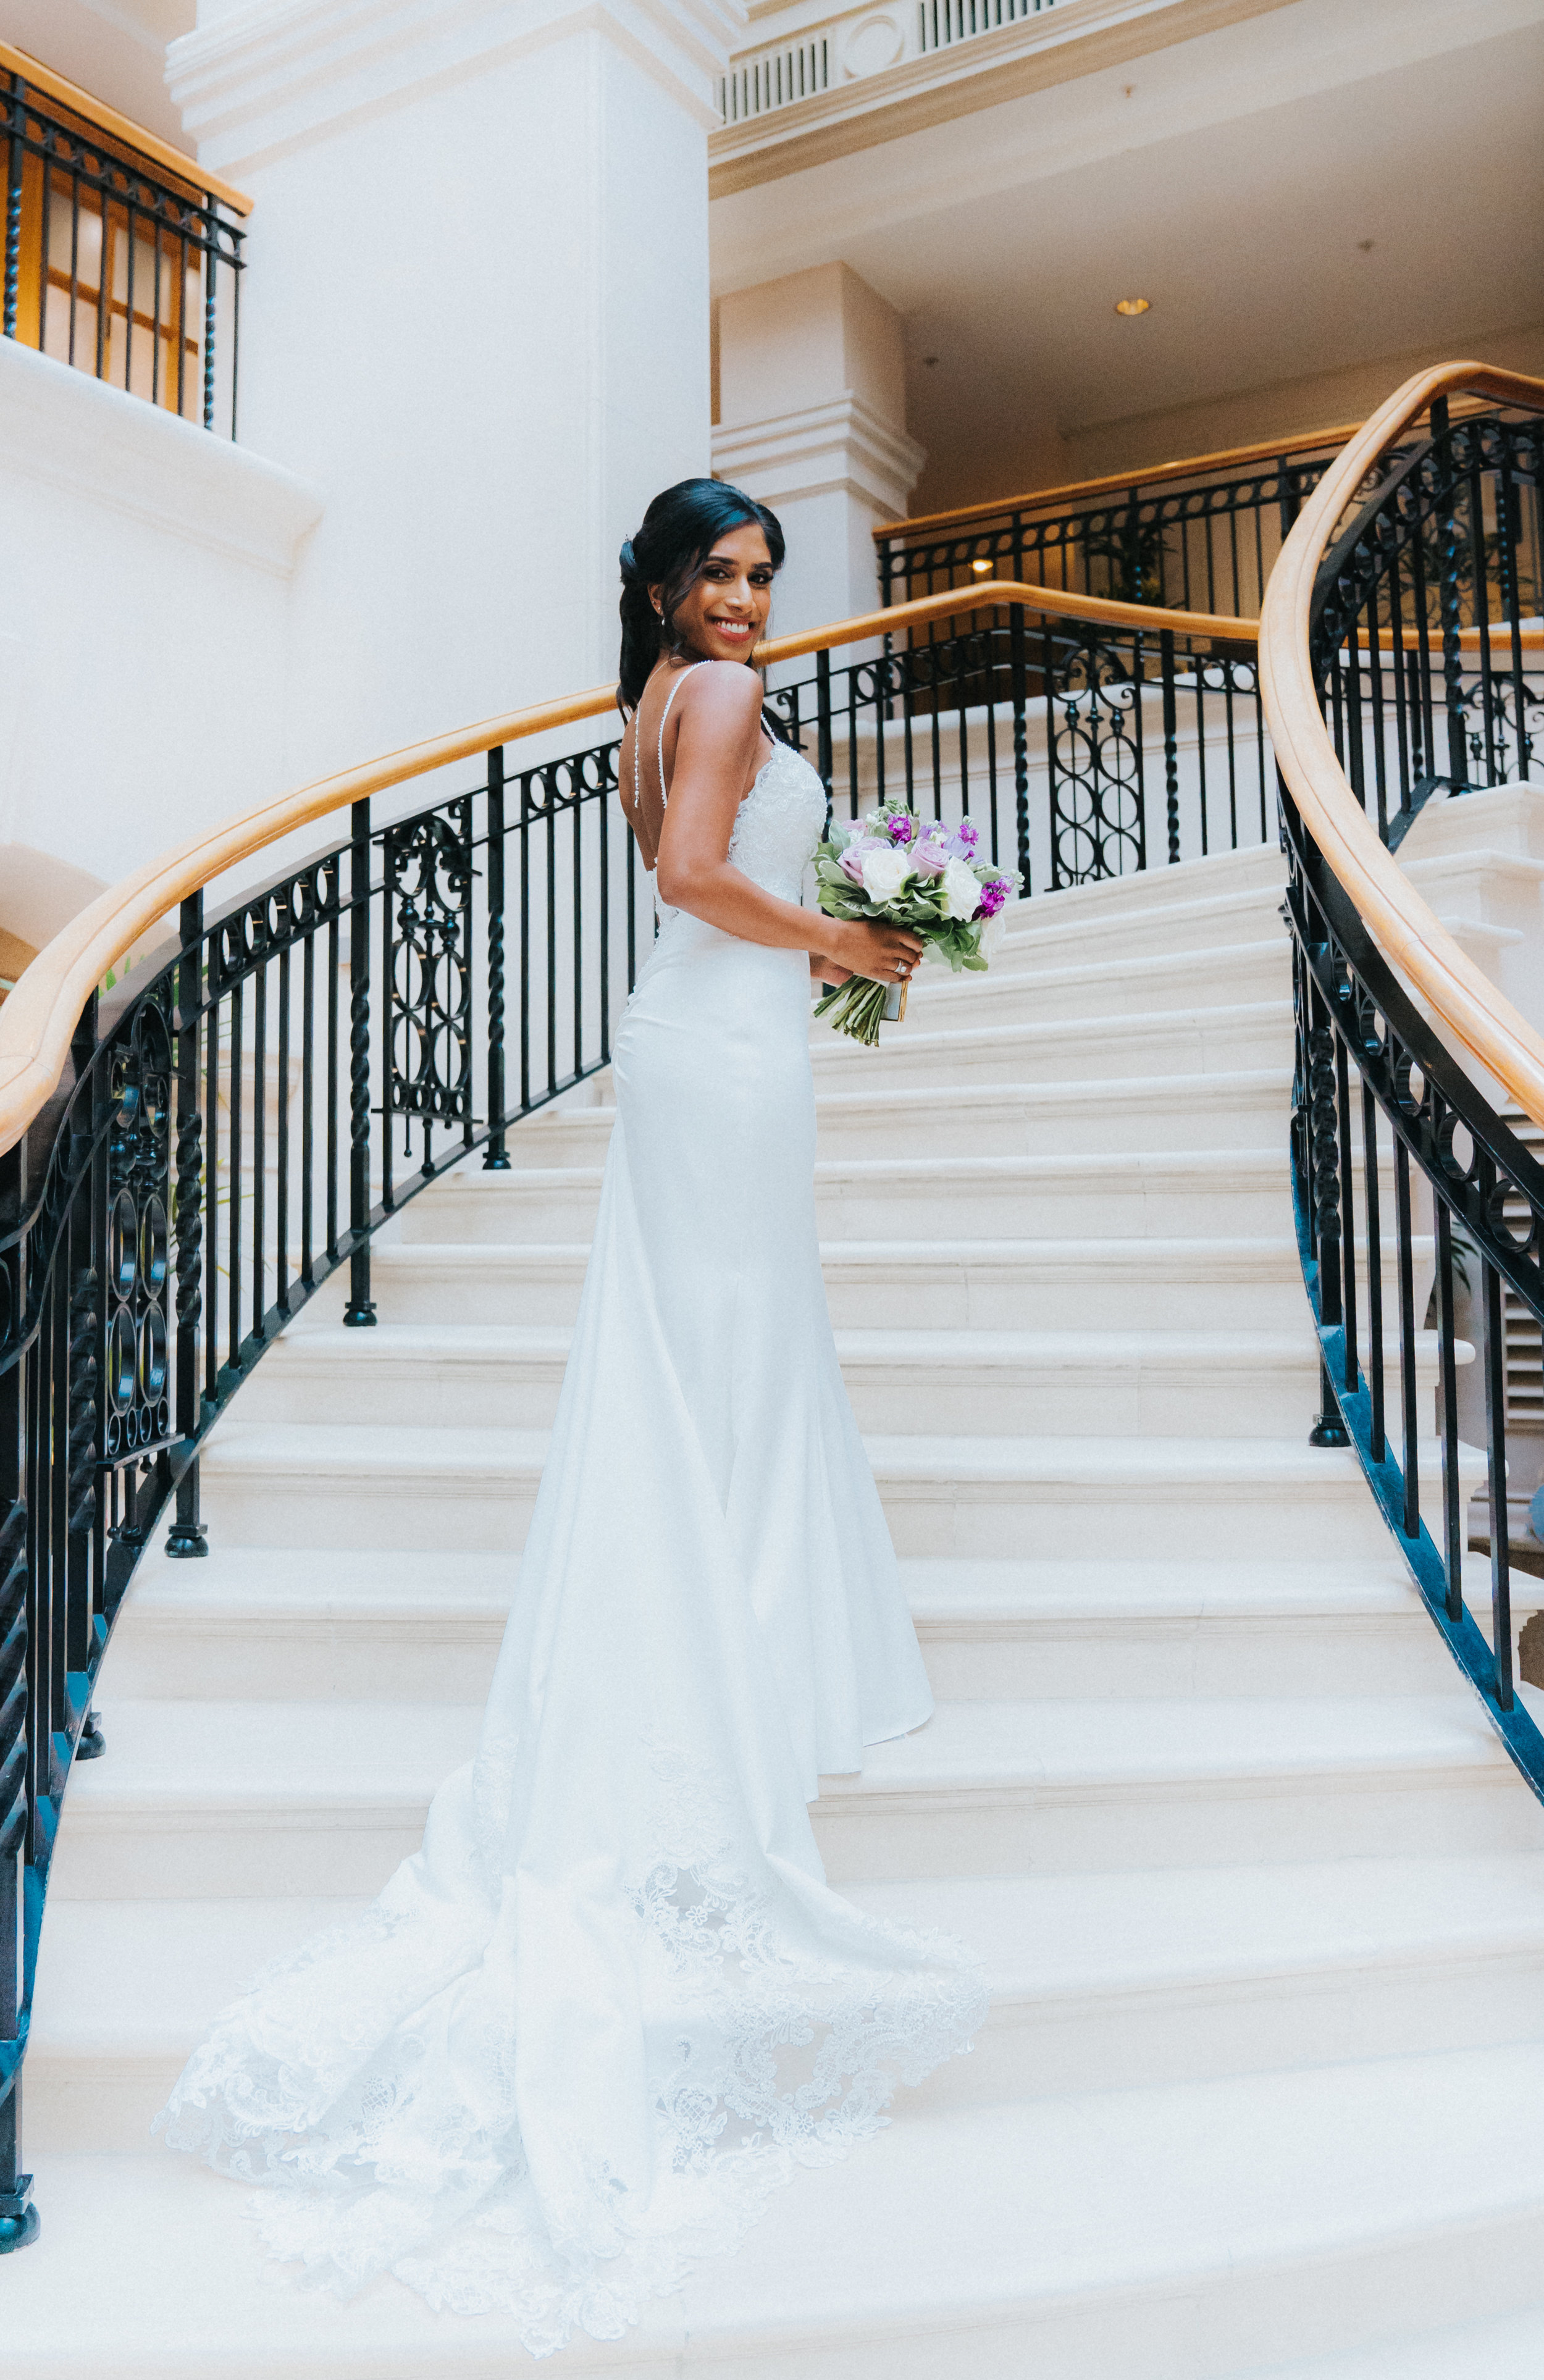 anglo-asian-hindu-civil-wedding-photography-videography-london-portrait-marylebone-old-town-hall-landmark-hotel-18